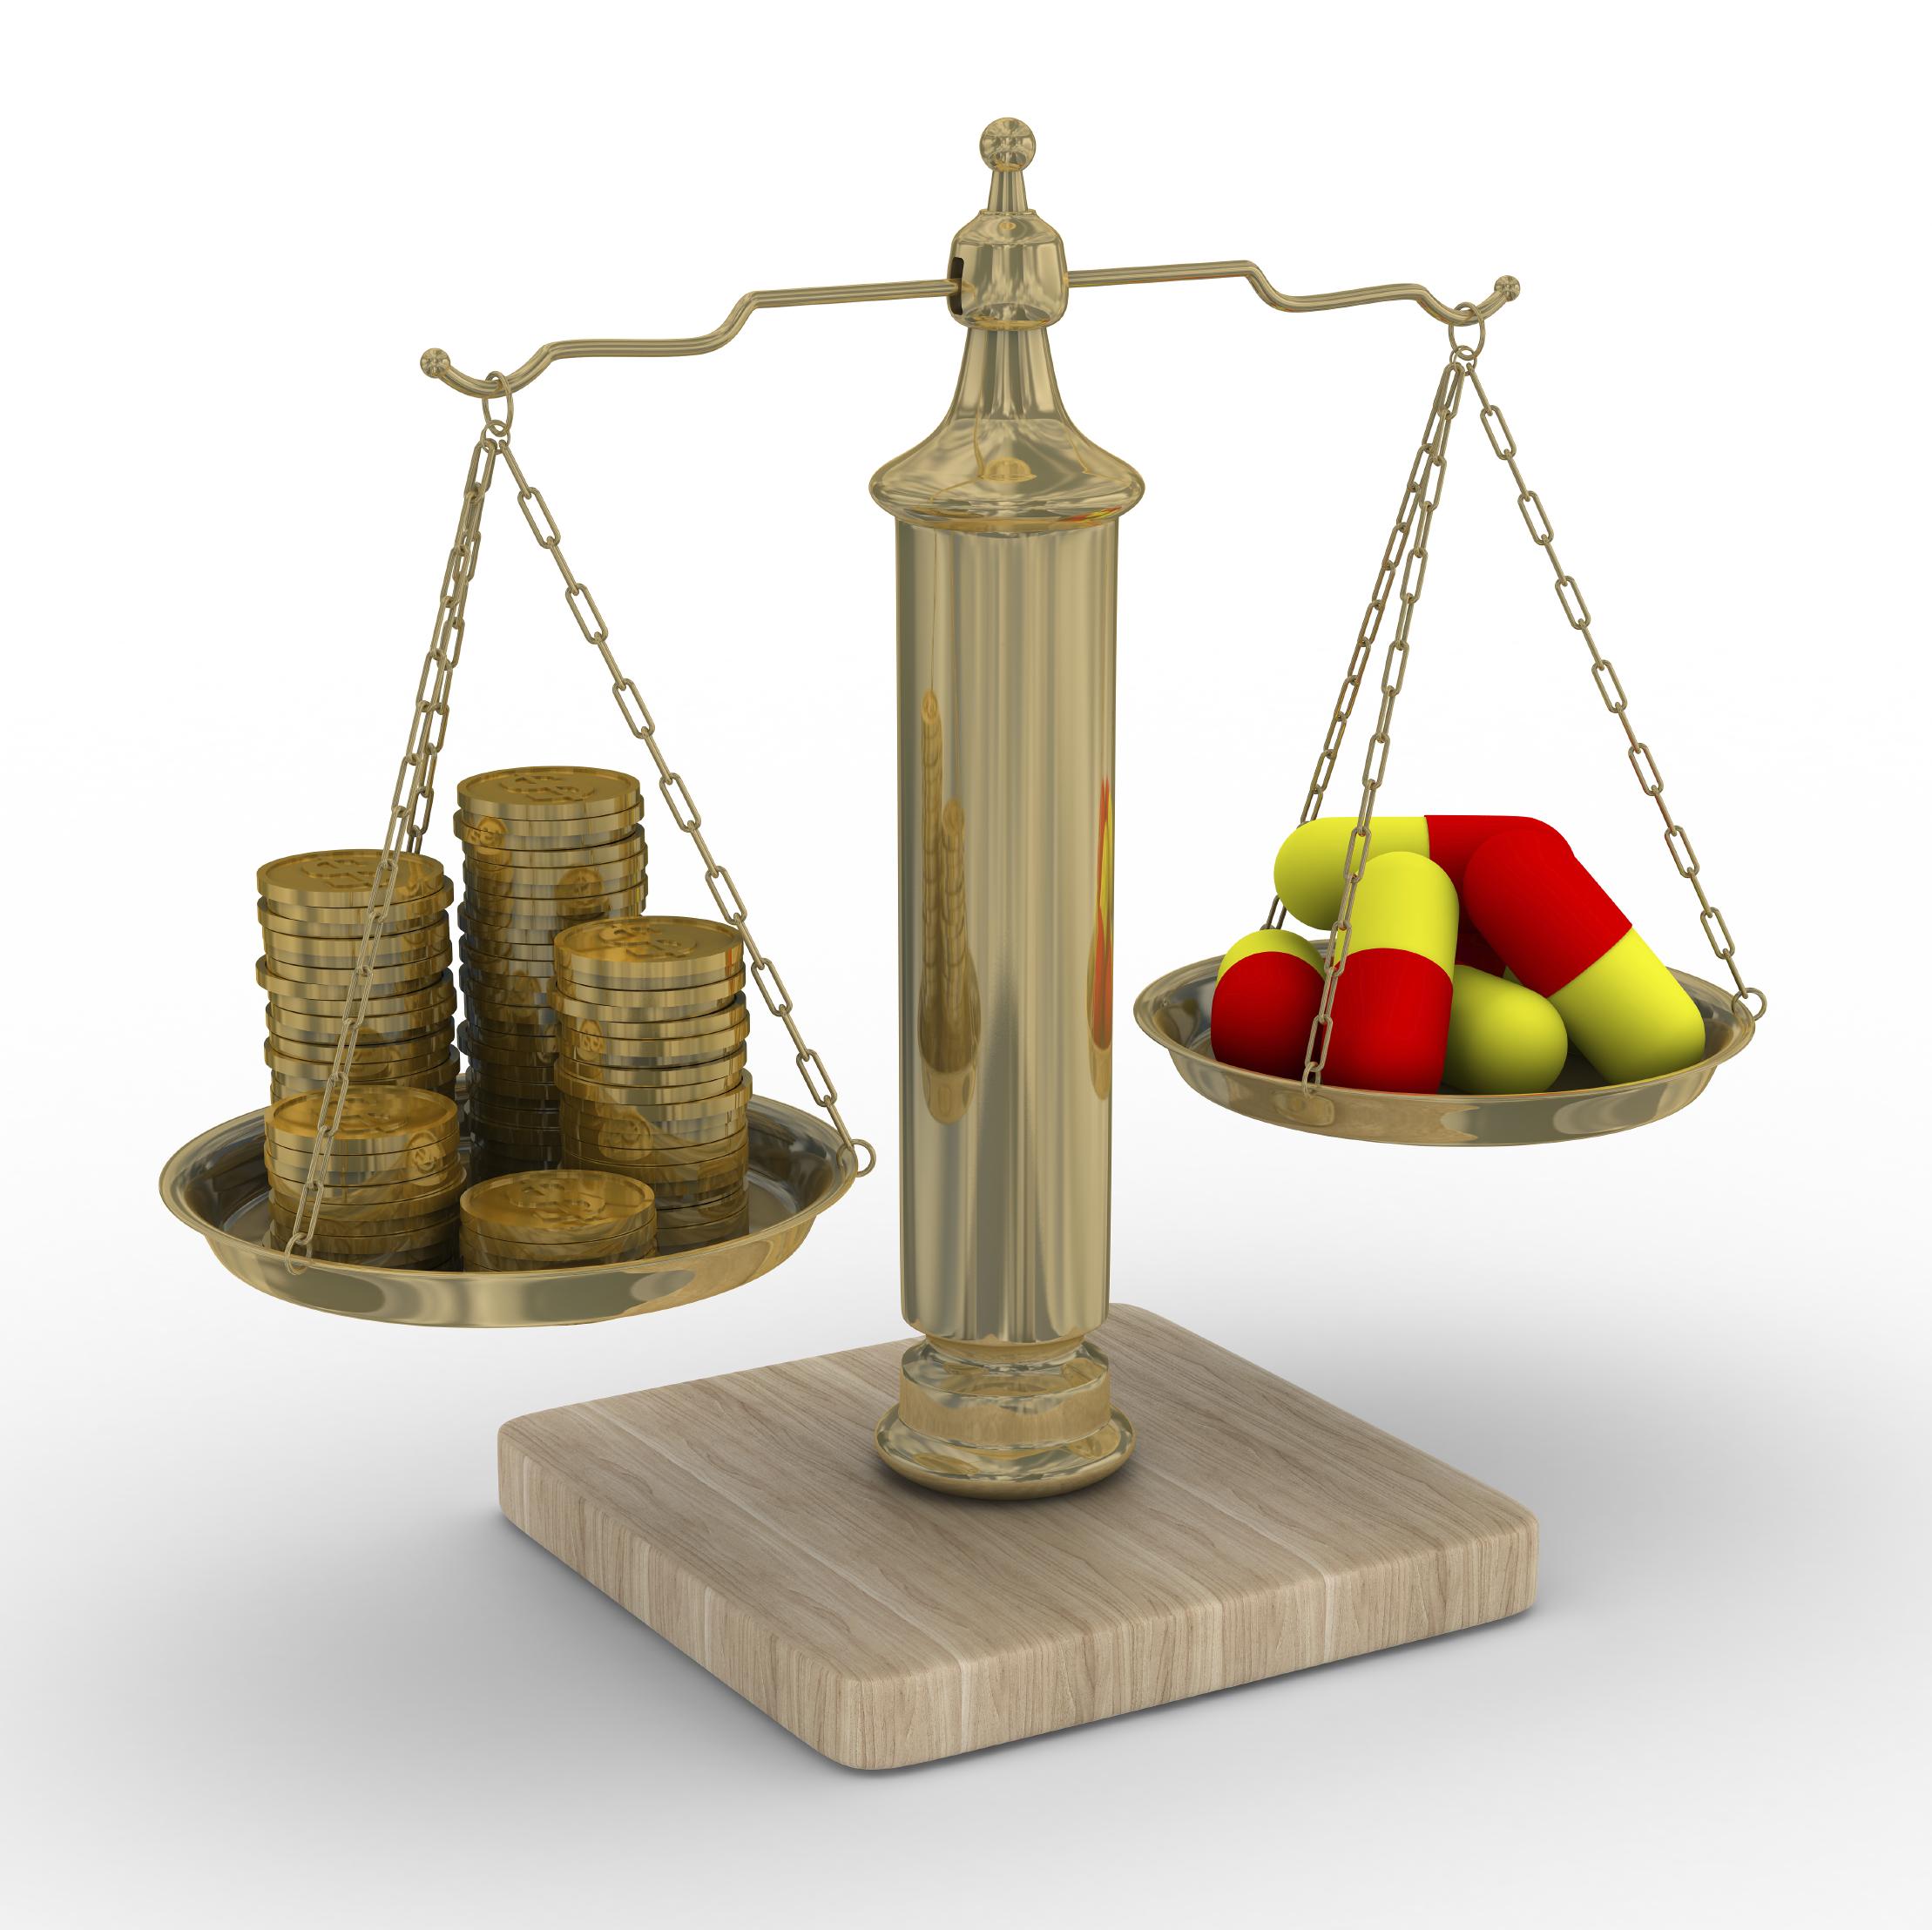 Rhetorical analysis of pharmaceutical innovation can